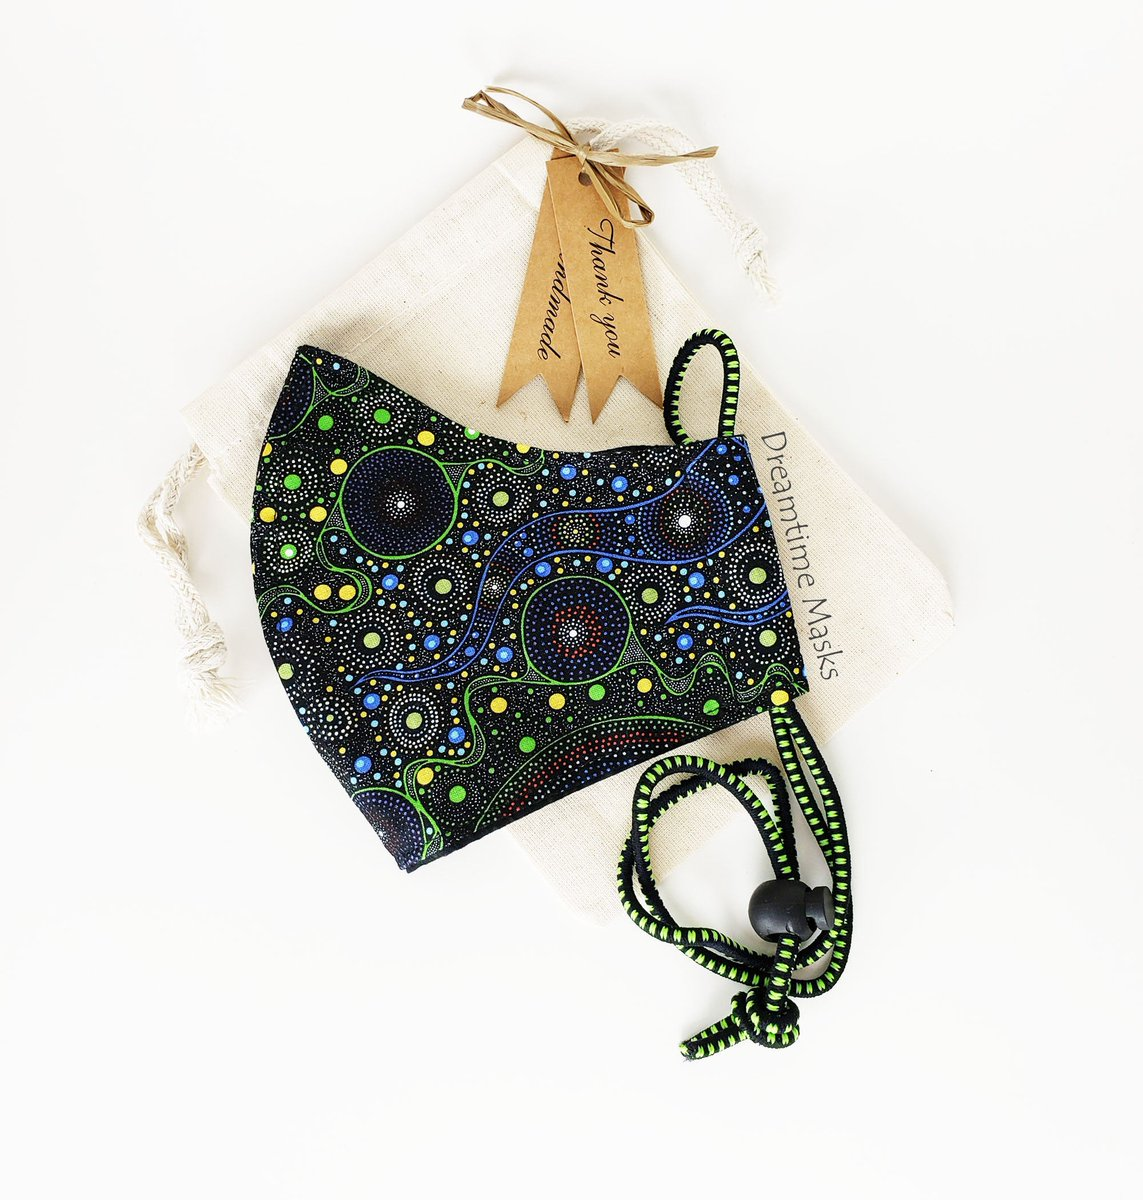 Aboriginal Art Print Face Mask Black Blue Mask Washable Cotton Face Covering Spiritual Women  #facemask #Etsy #staysafe #wearthedammmask #stayhome #facemasks